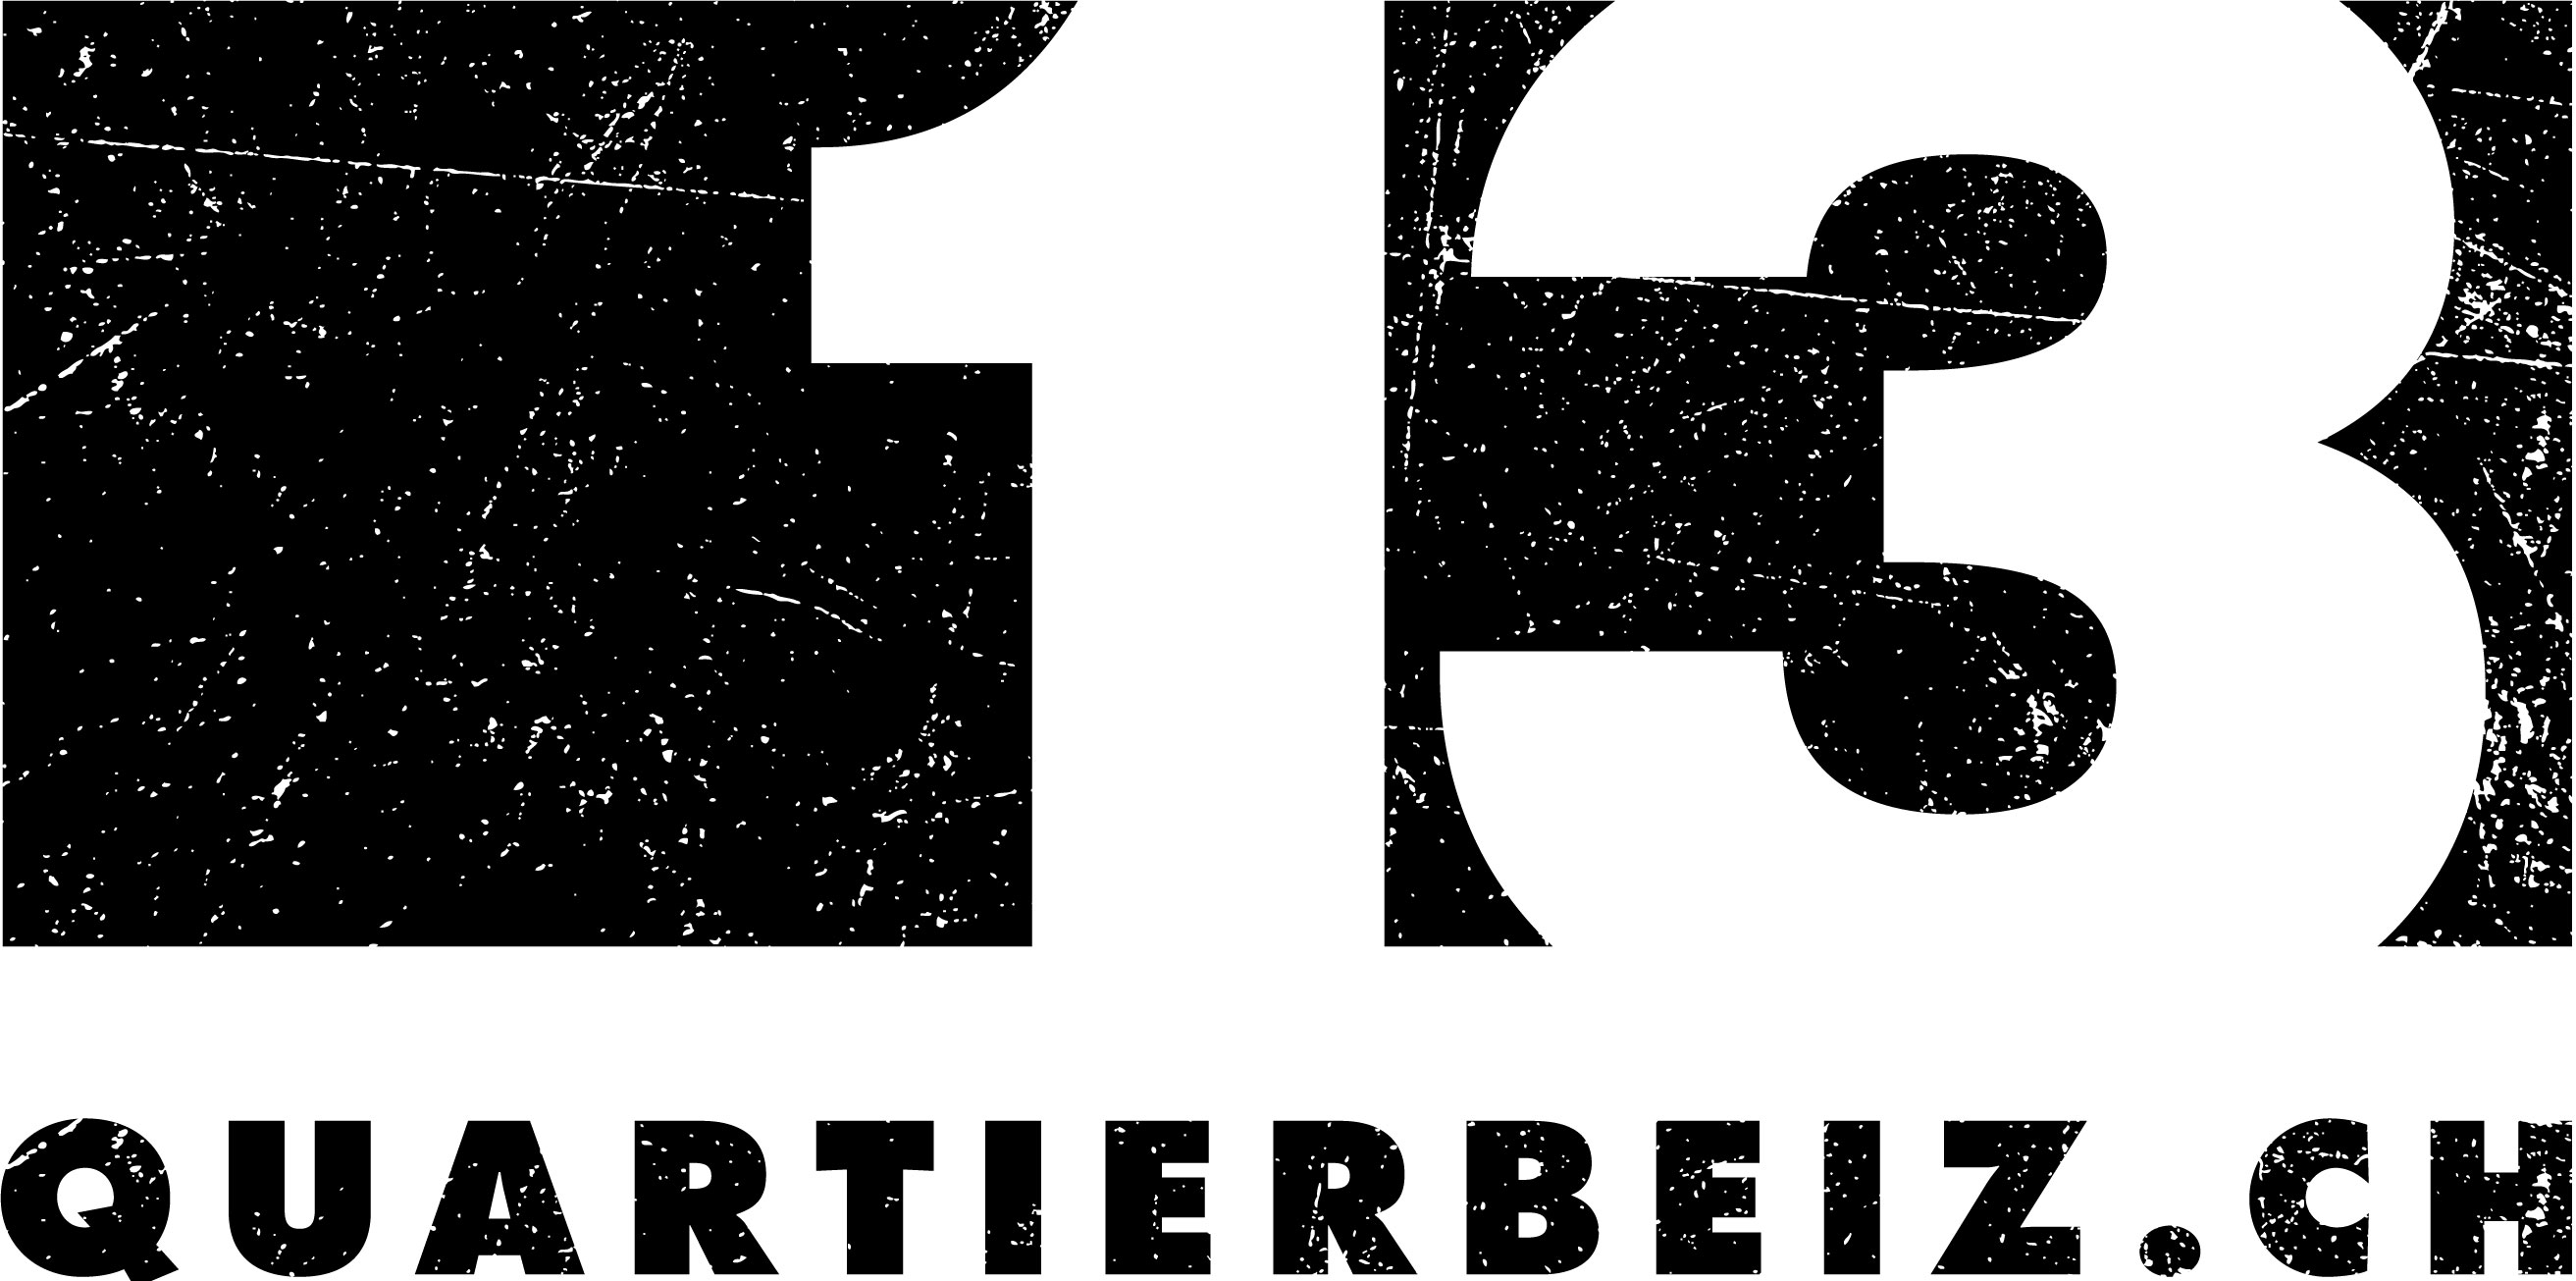 qb13-grunge-rz-black.jpg